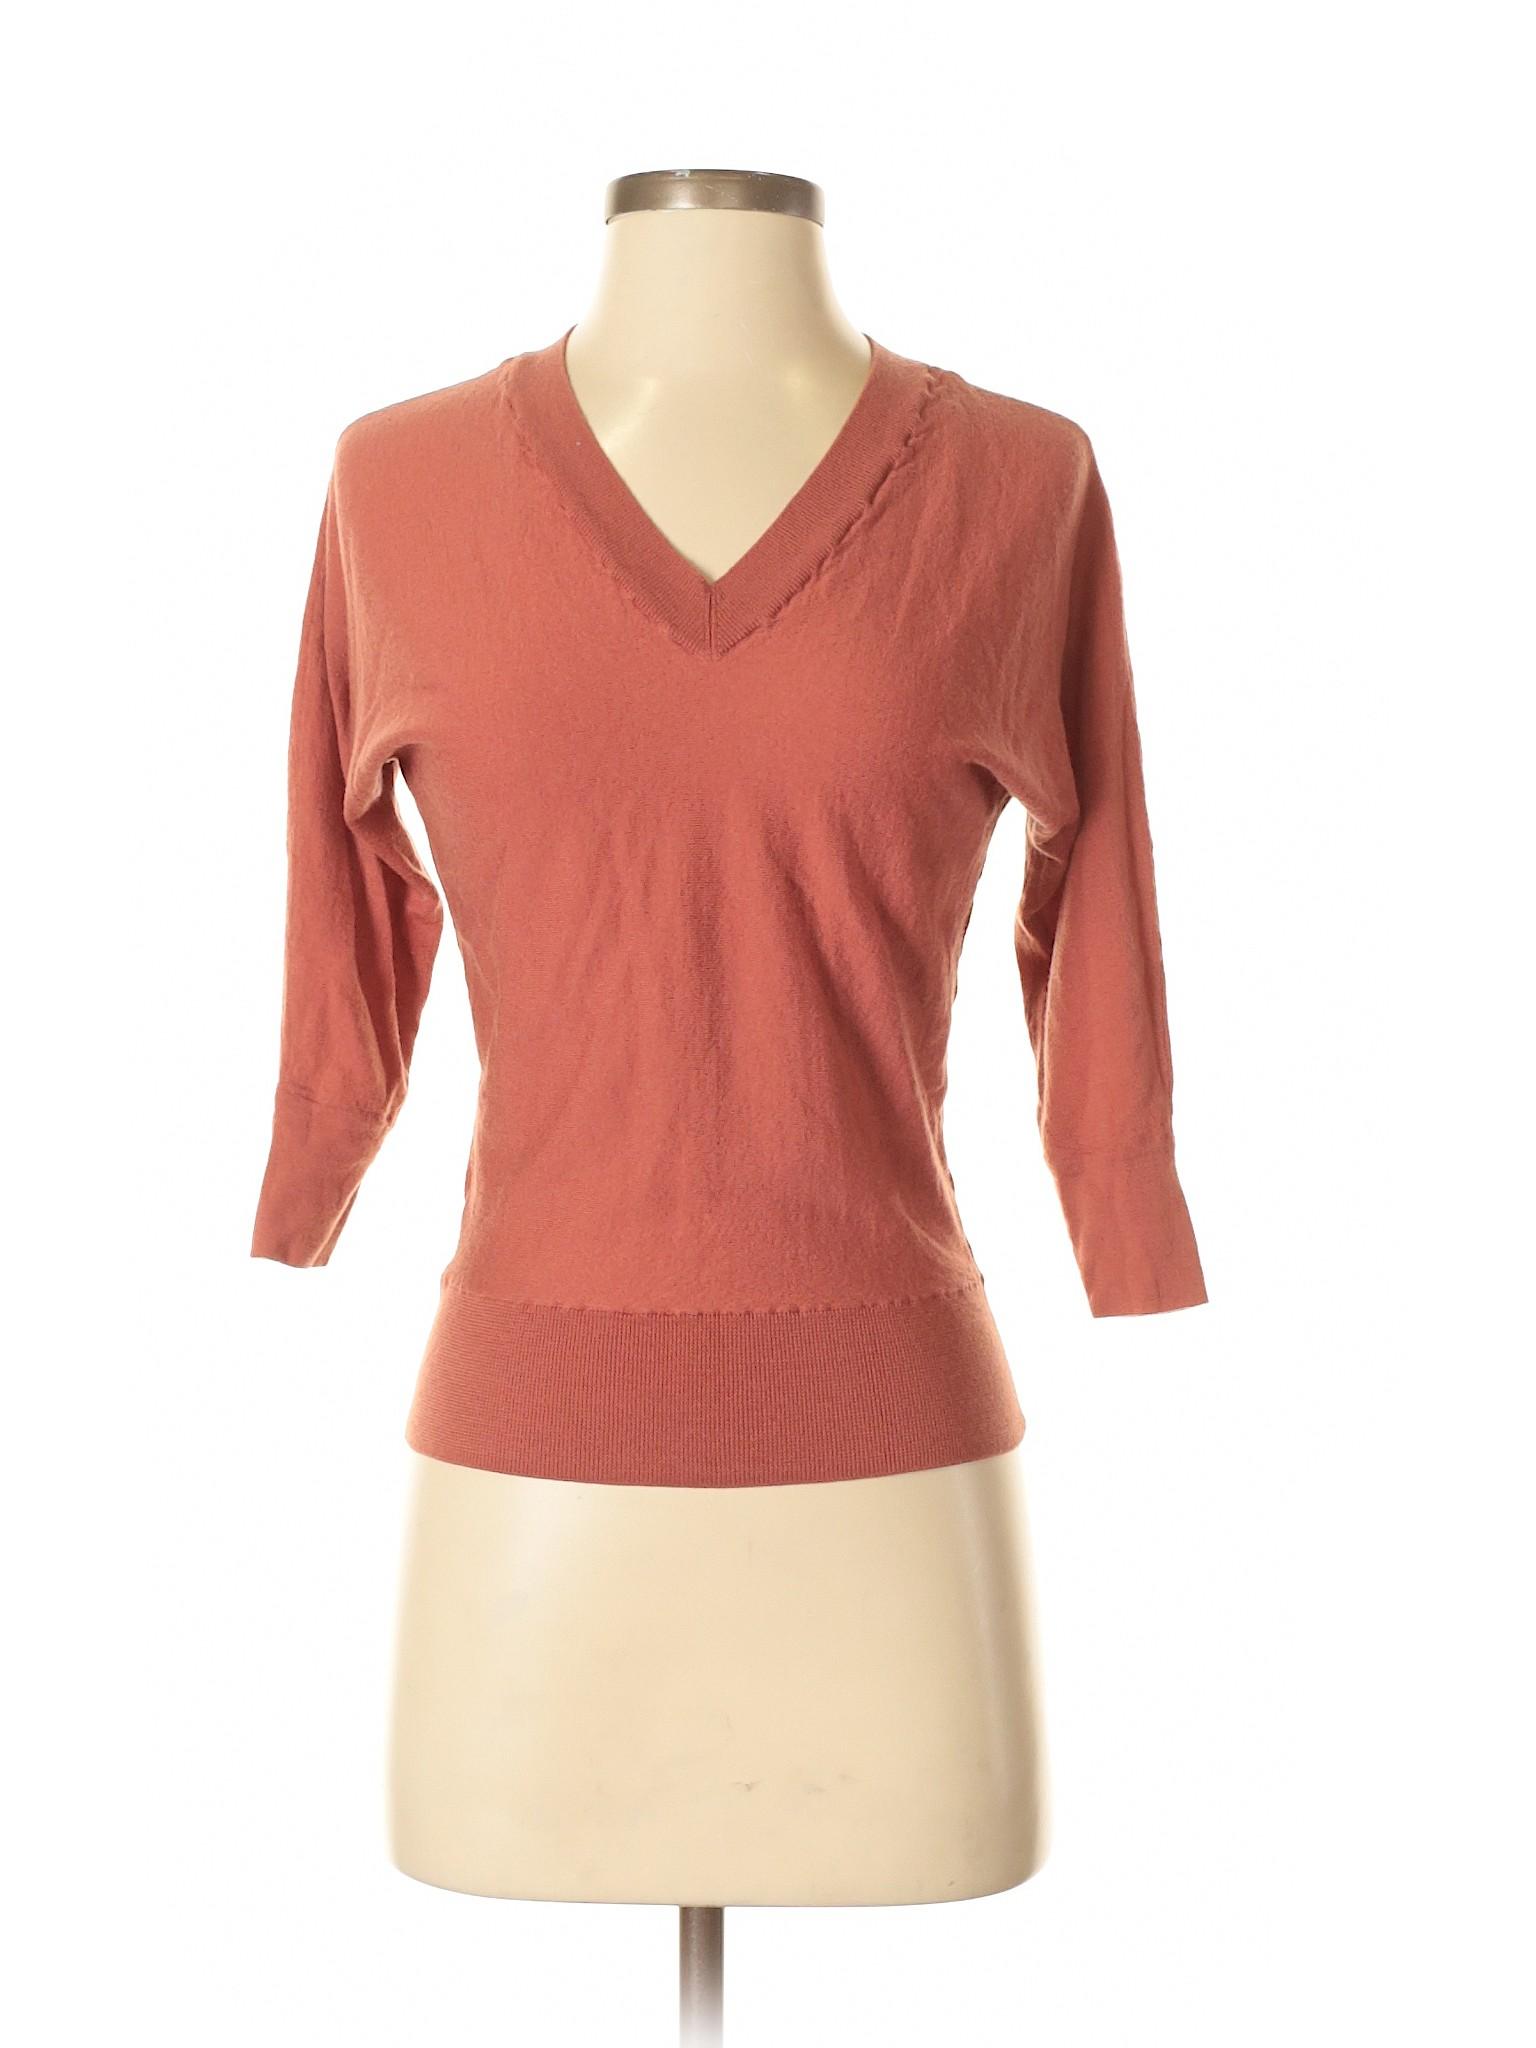 Wool LOFT Boutique Pullover Ann Taylor Sweater xtvqpOwq